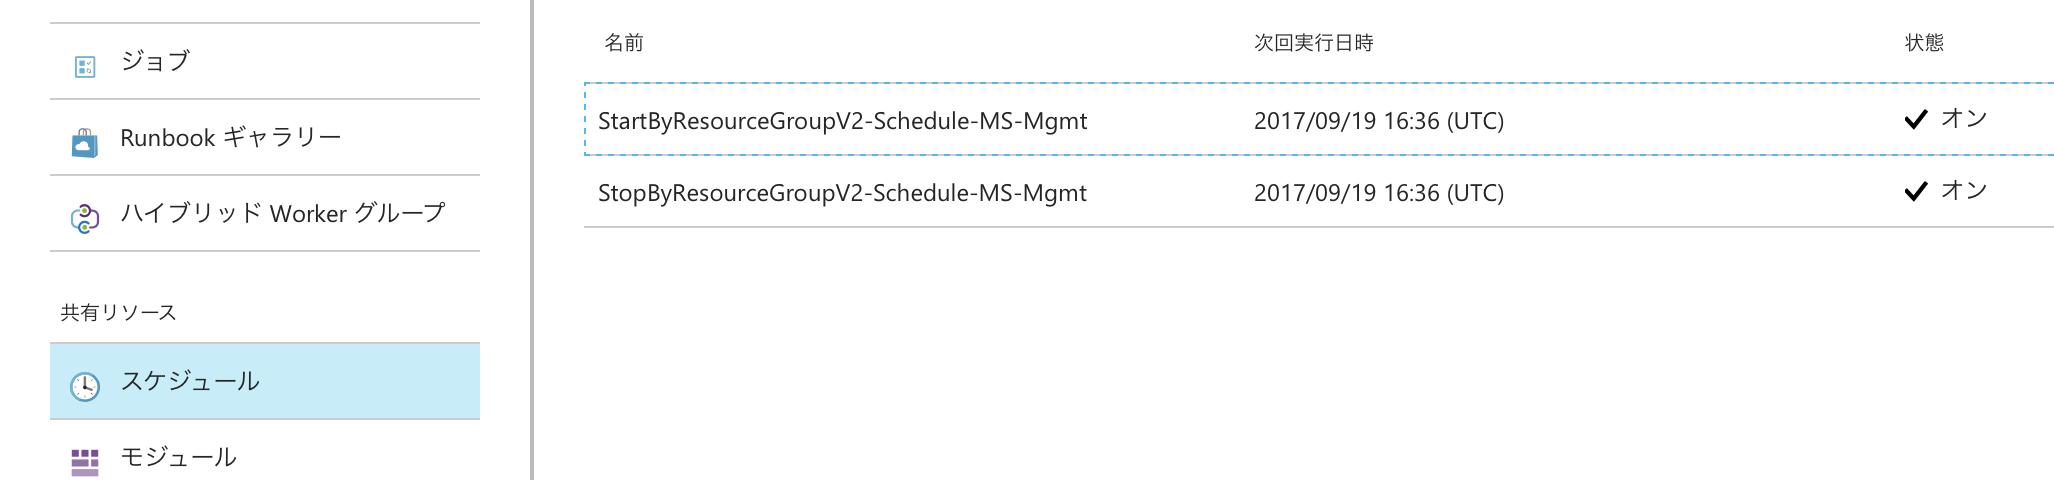 schedule_07.png